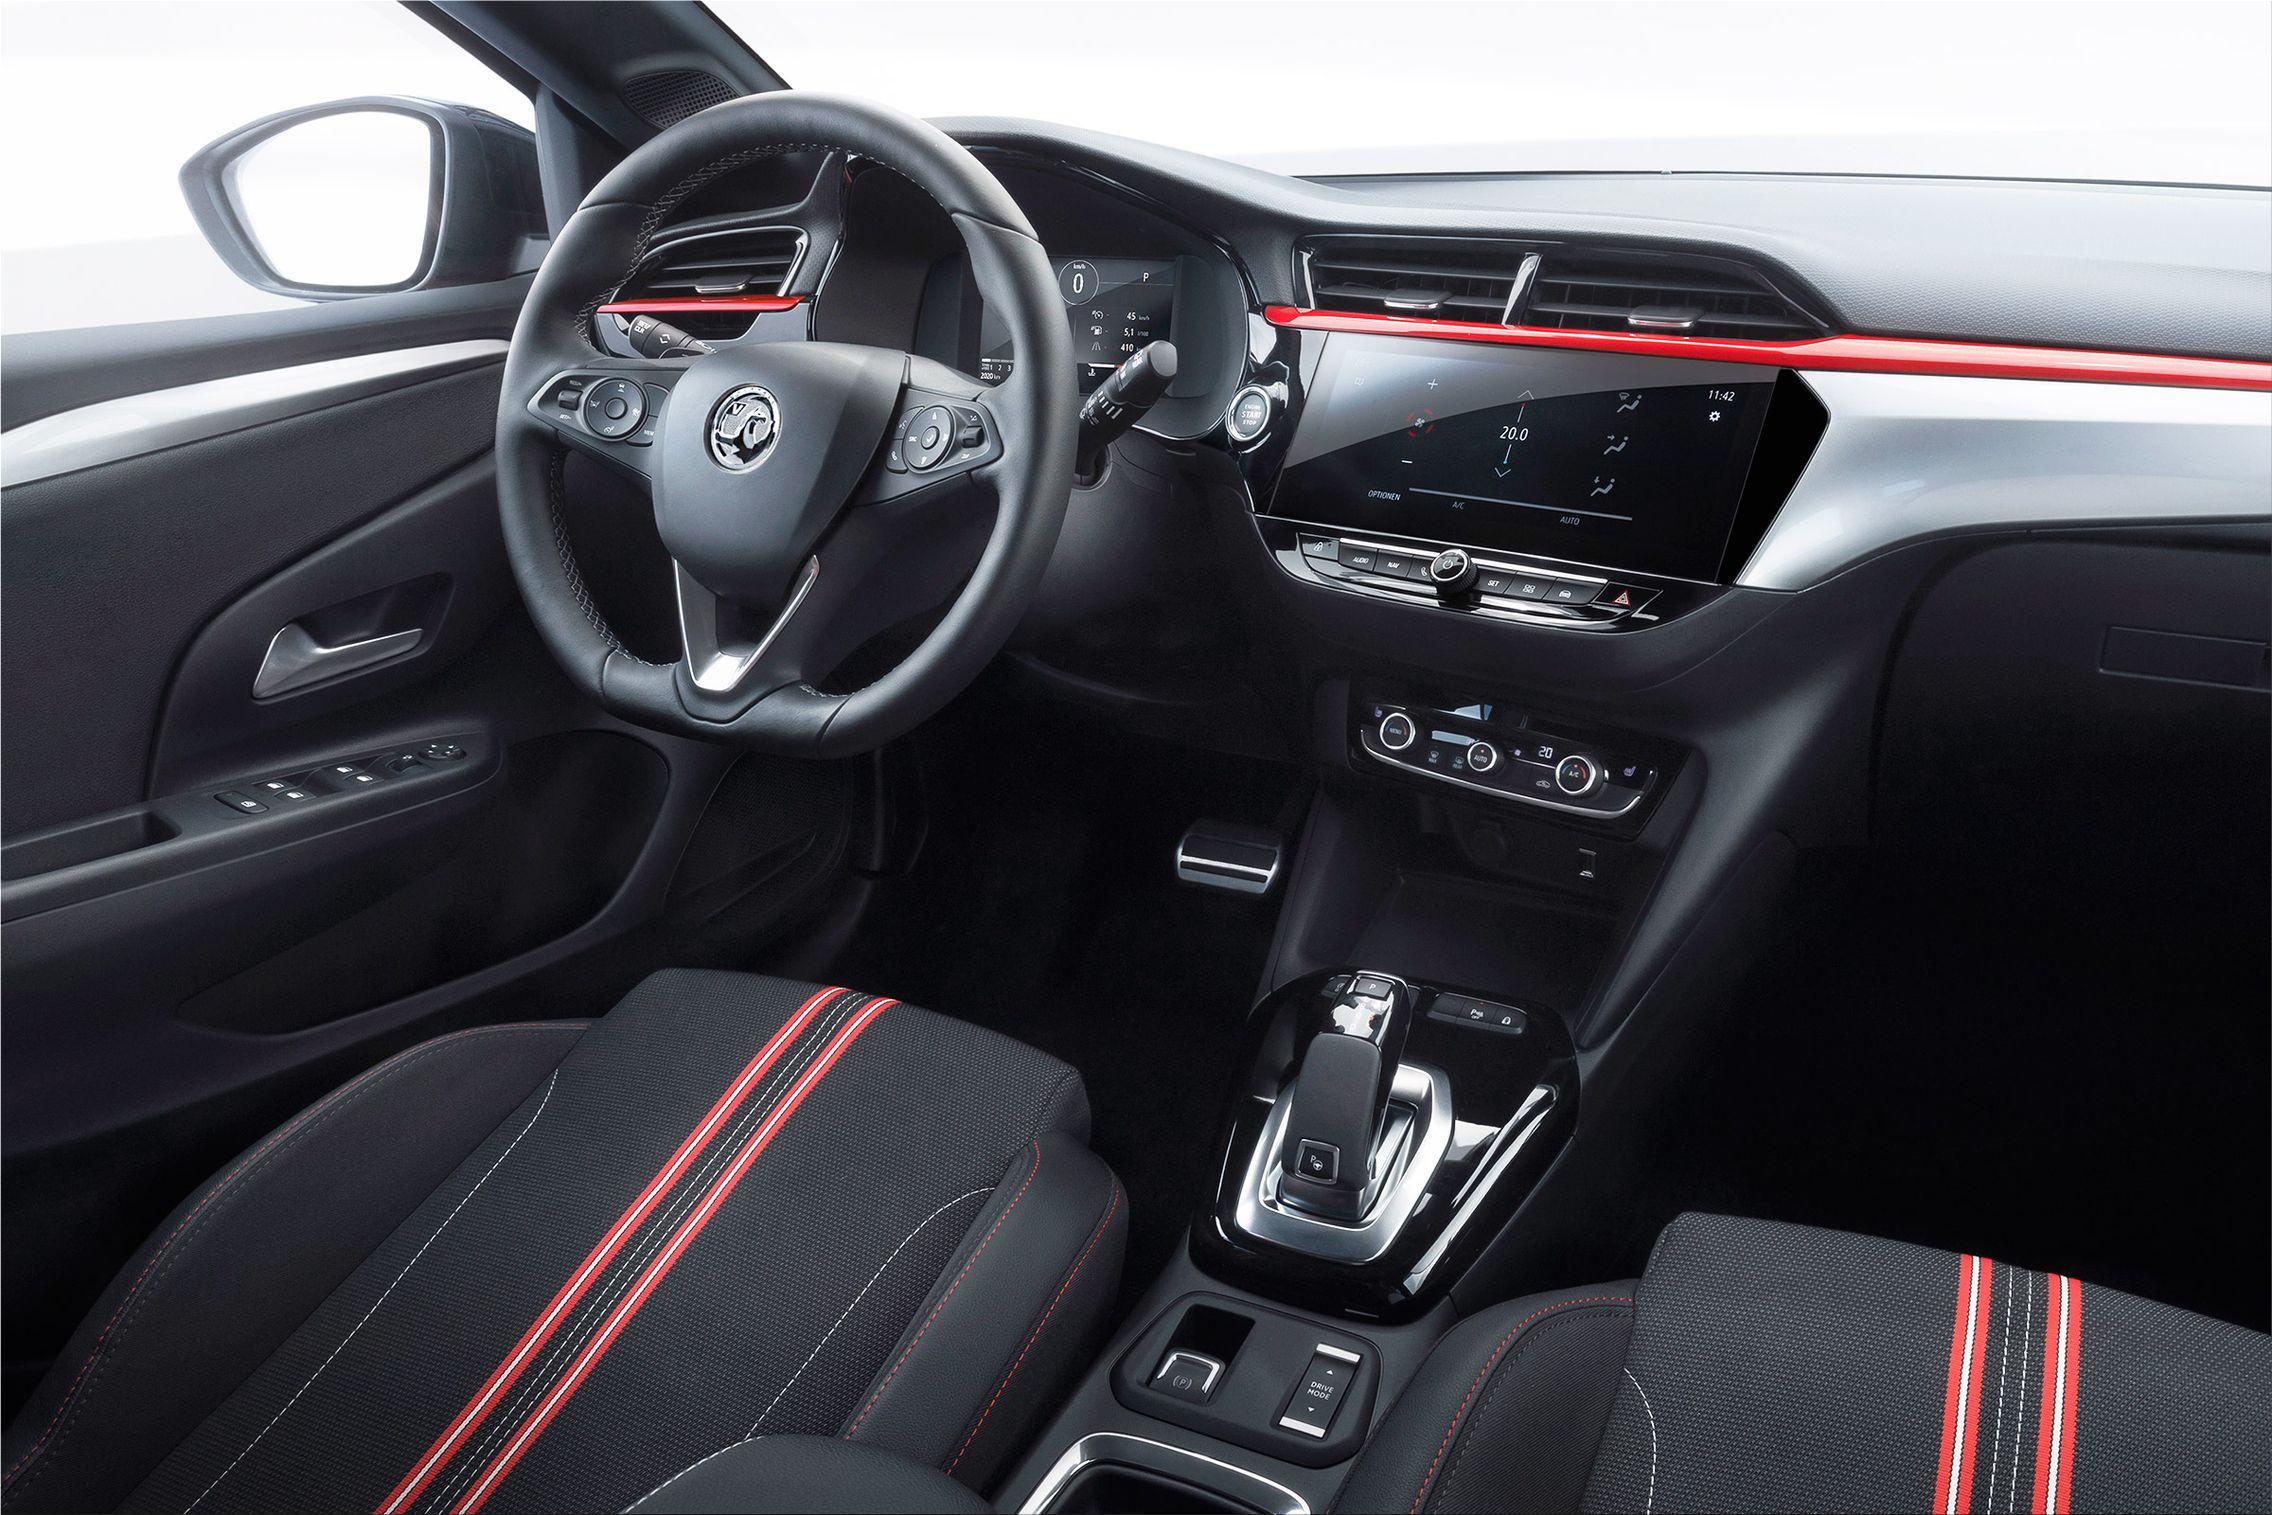 2020 Opel Corsa Is Manufactured In Spain Opel